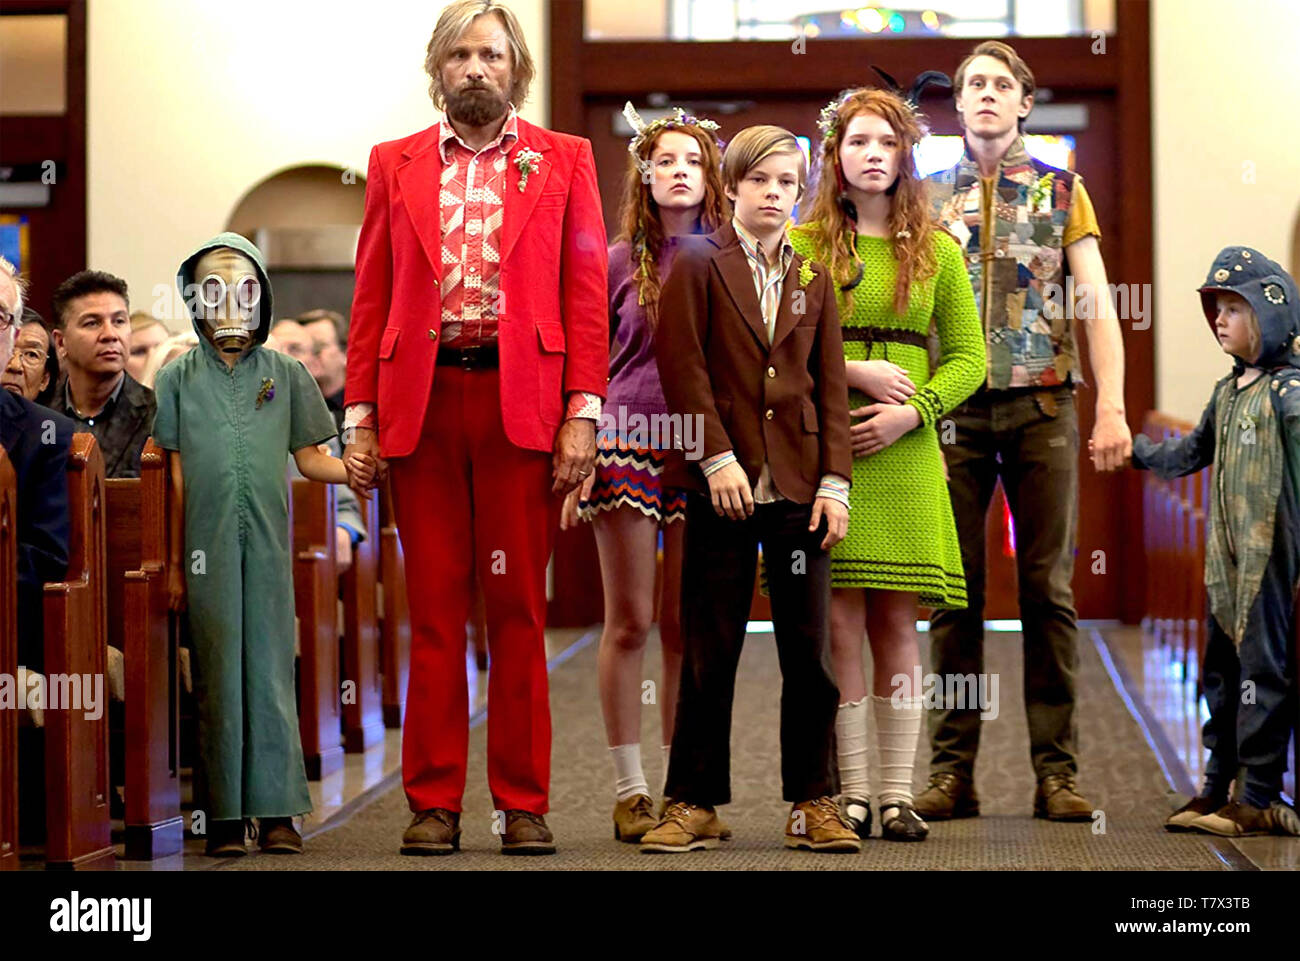 CAPTAIN FANTASTIC 2016 Electric City Entertainment film with Viggo Mortensen as Bern - Stock Image